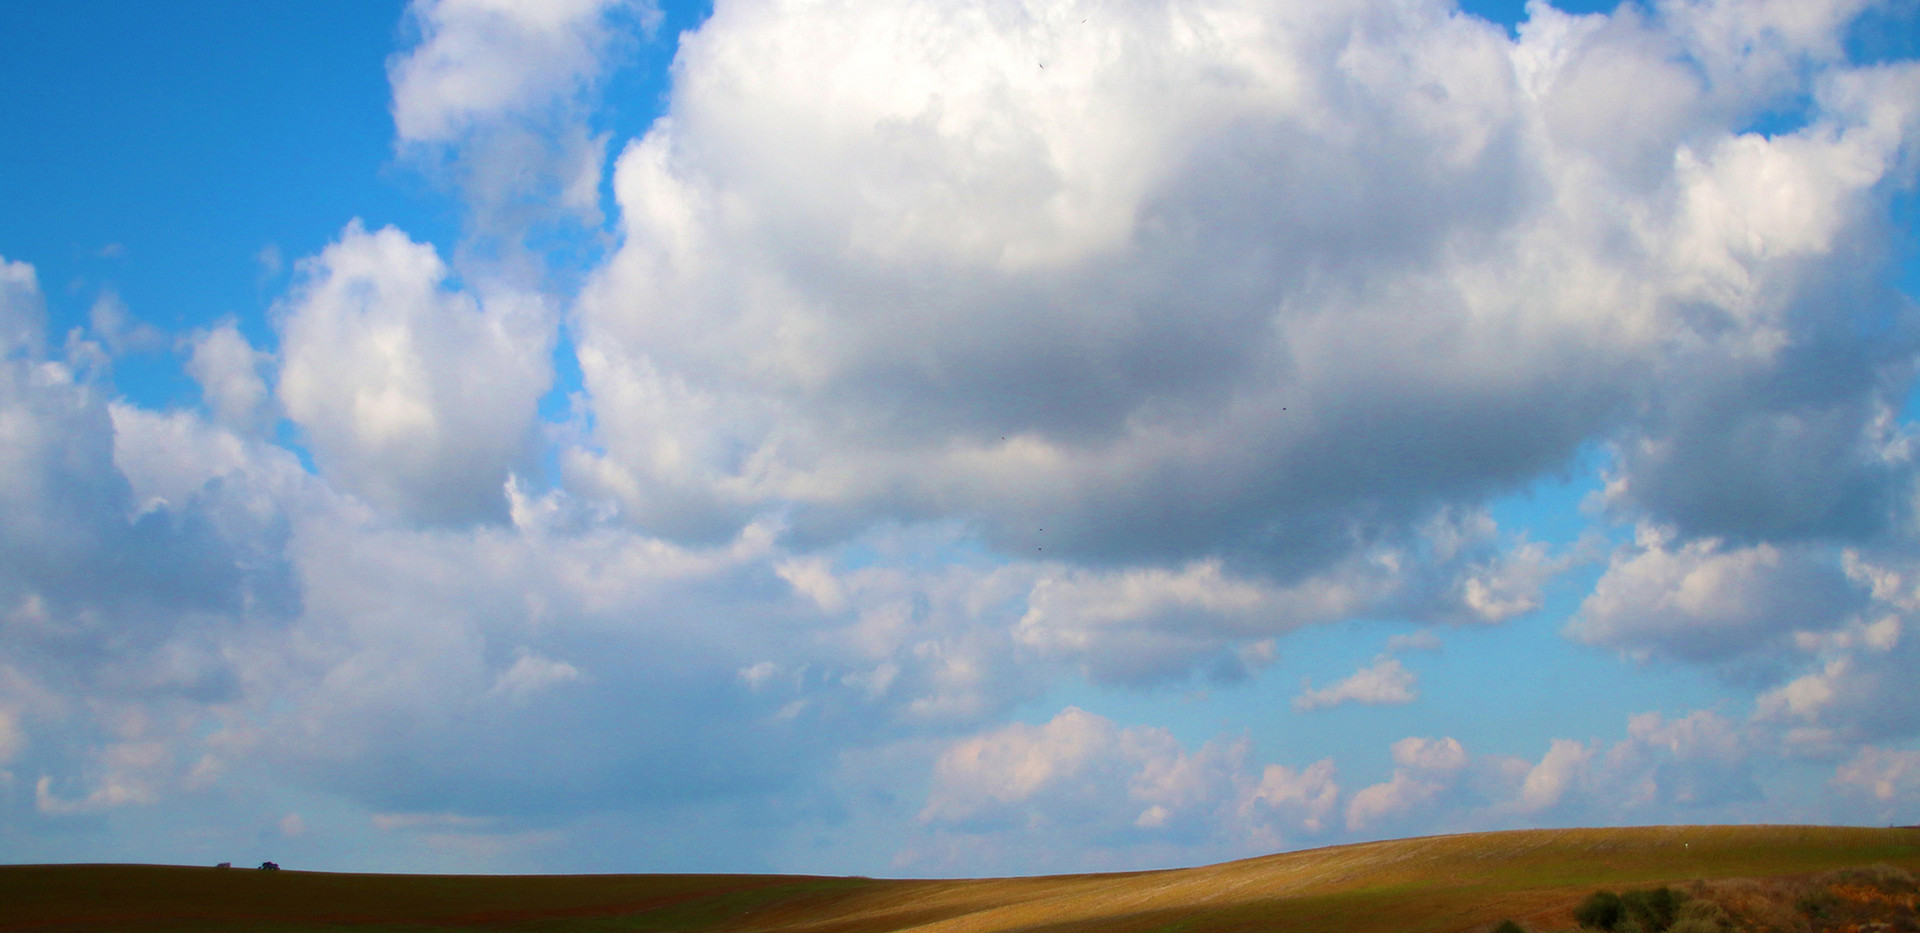 KRISTIN INBAL, The Cloud